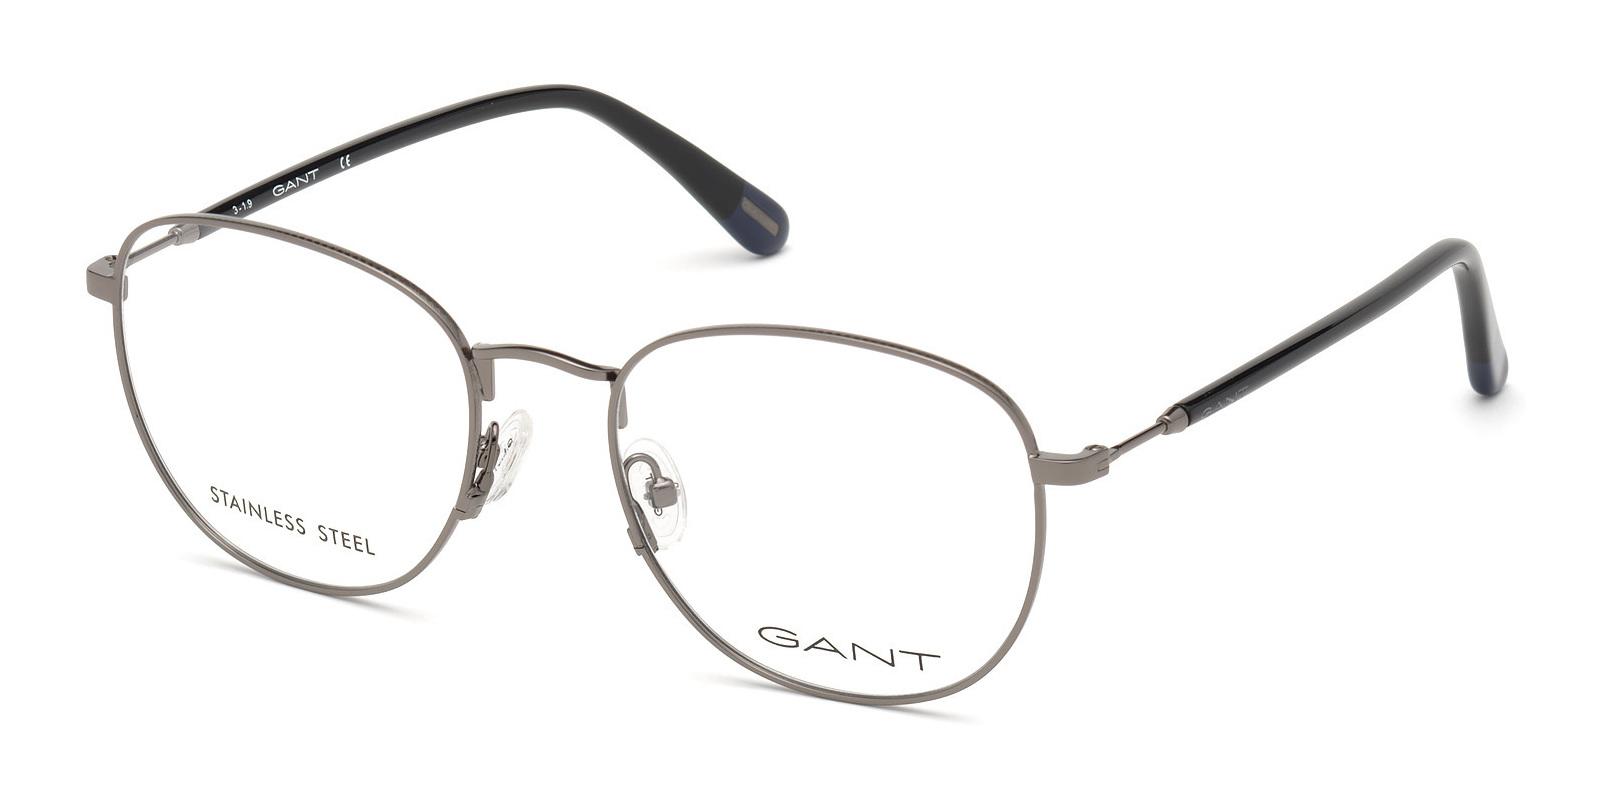 Gant Ga3196